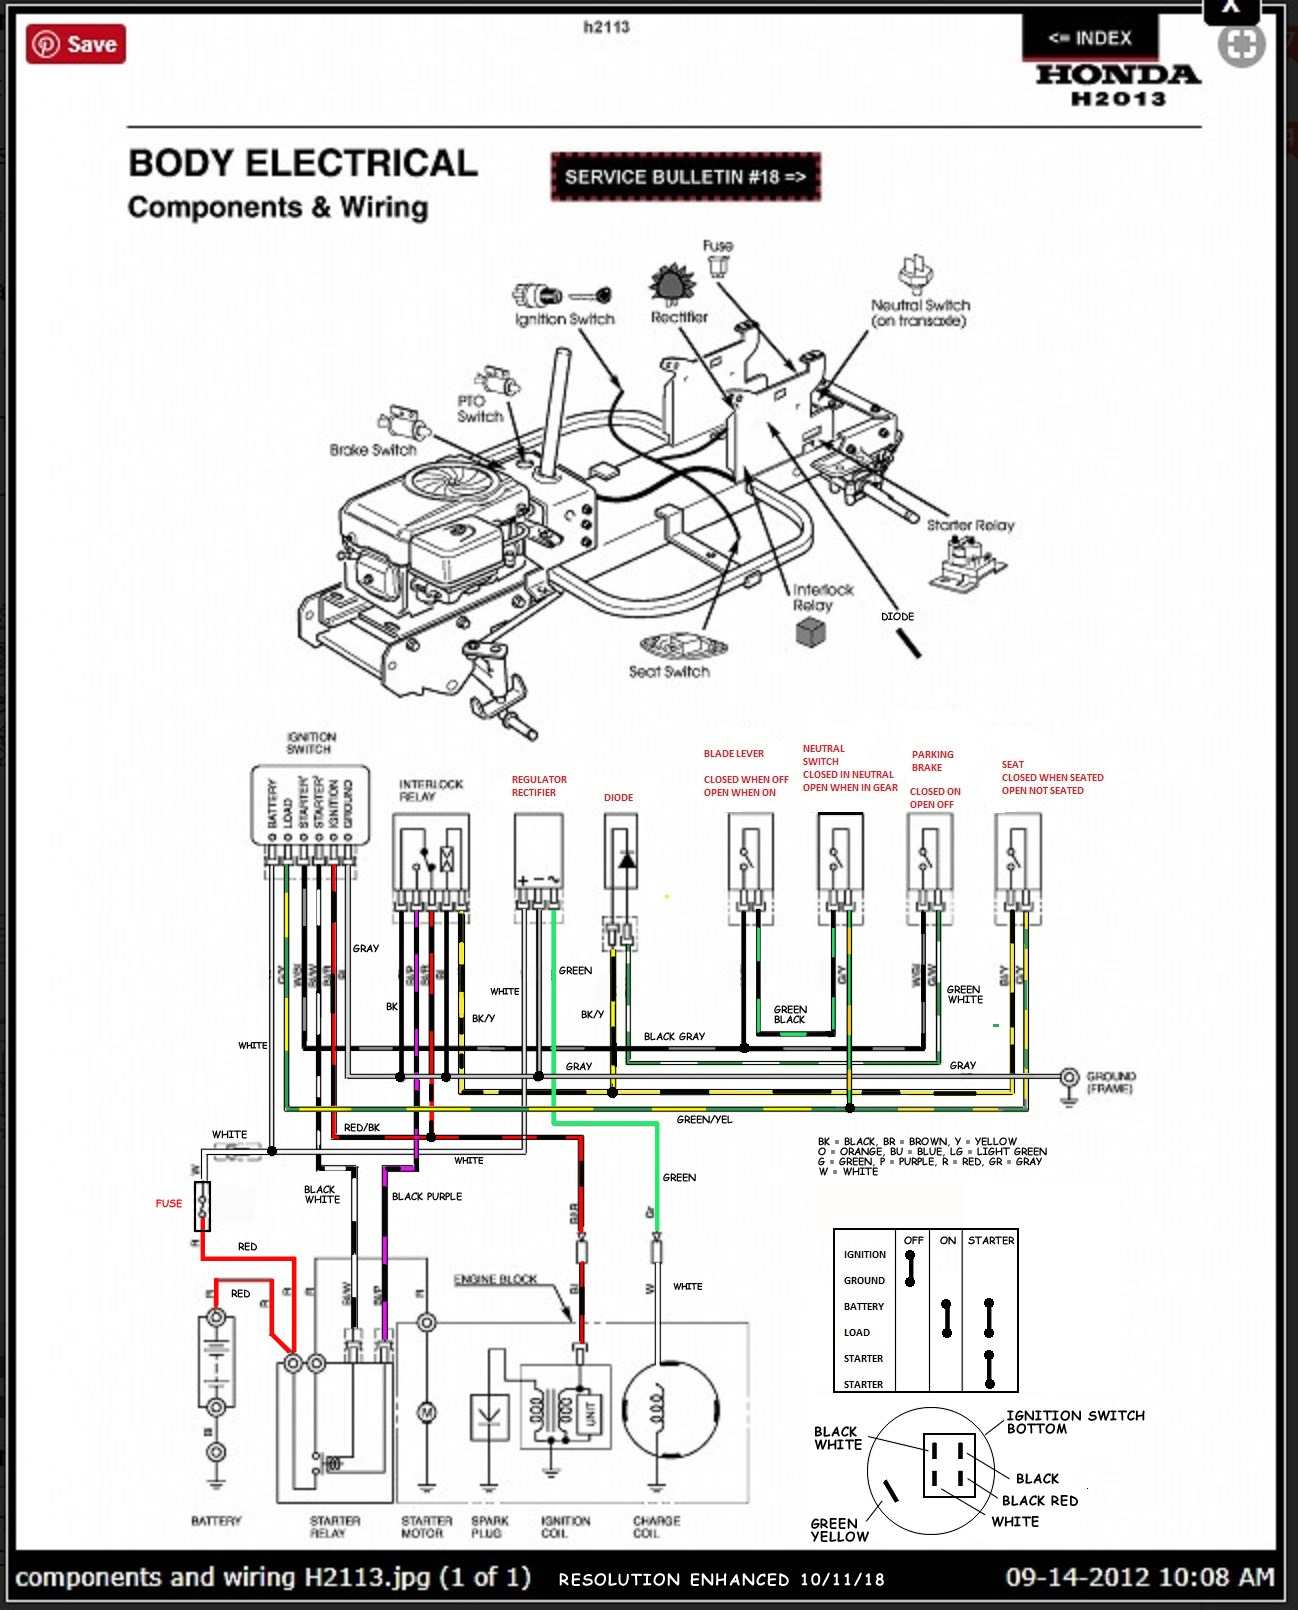 Honda Harmony 2113 Hydro, (ignition wiring) | My Tractor ForumMy Tractor Forum